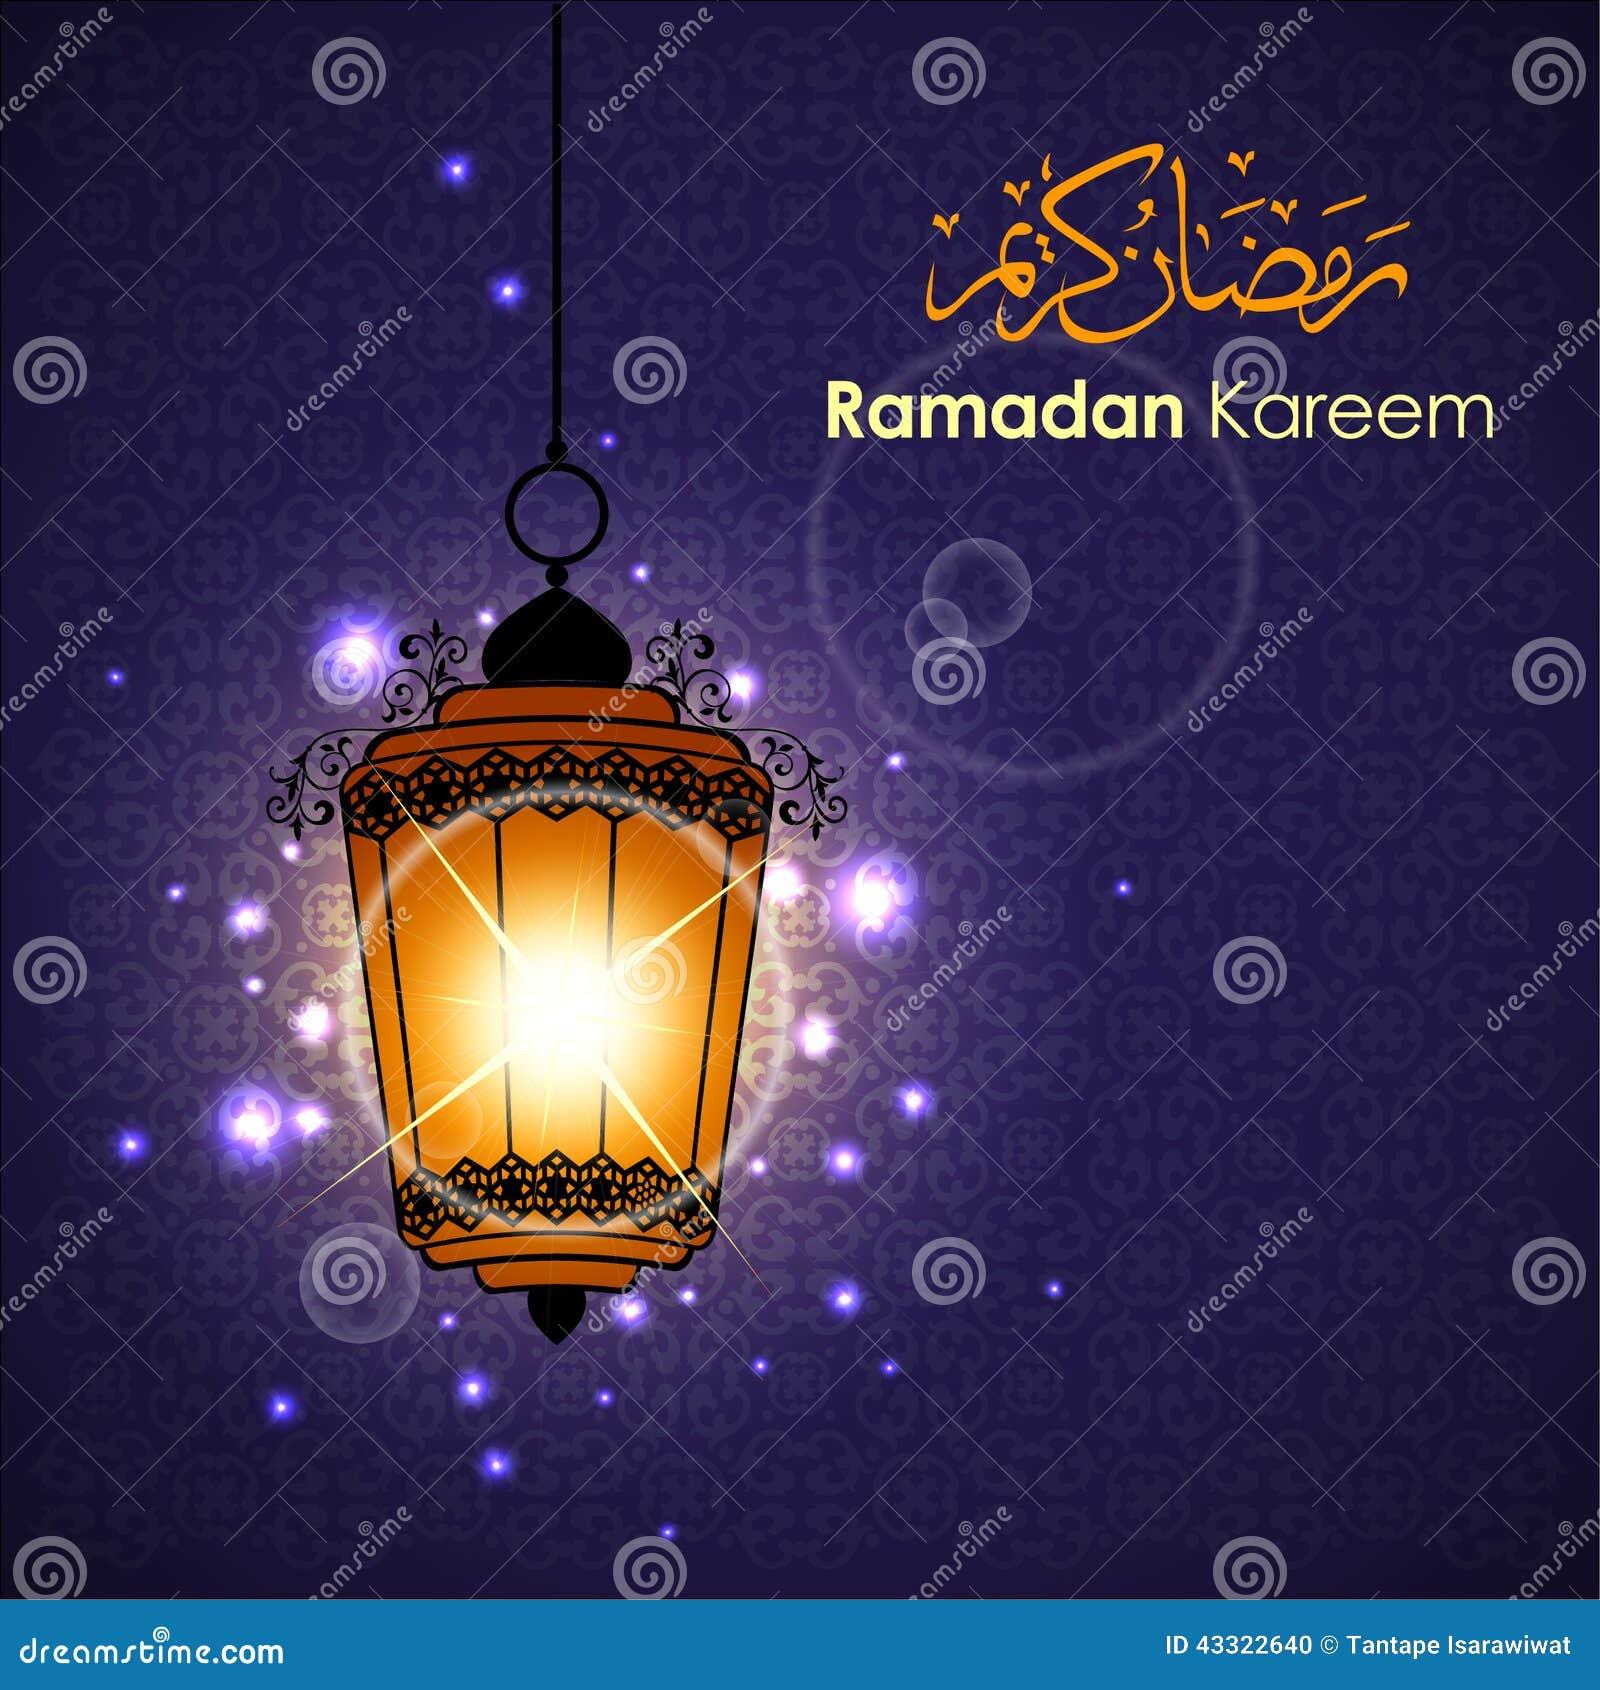 Ramadan greetings in arabic script stock vector illustration of ramadan greetings in arabic script greeting festival kristyandbryce Images